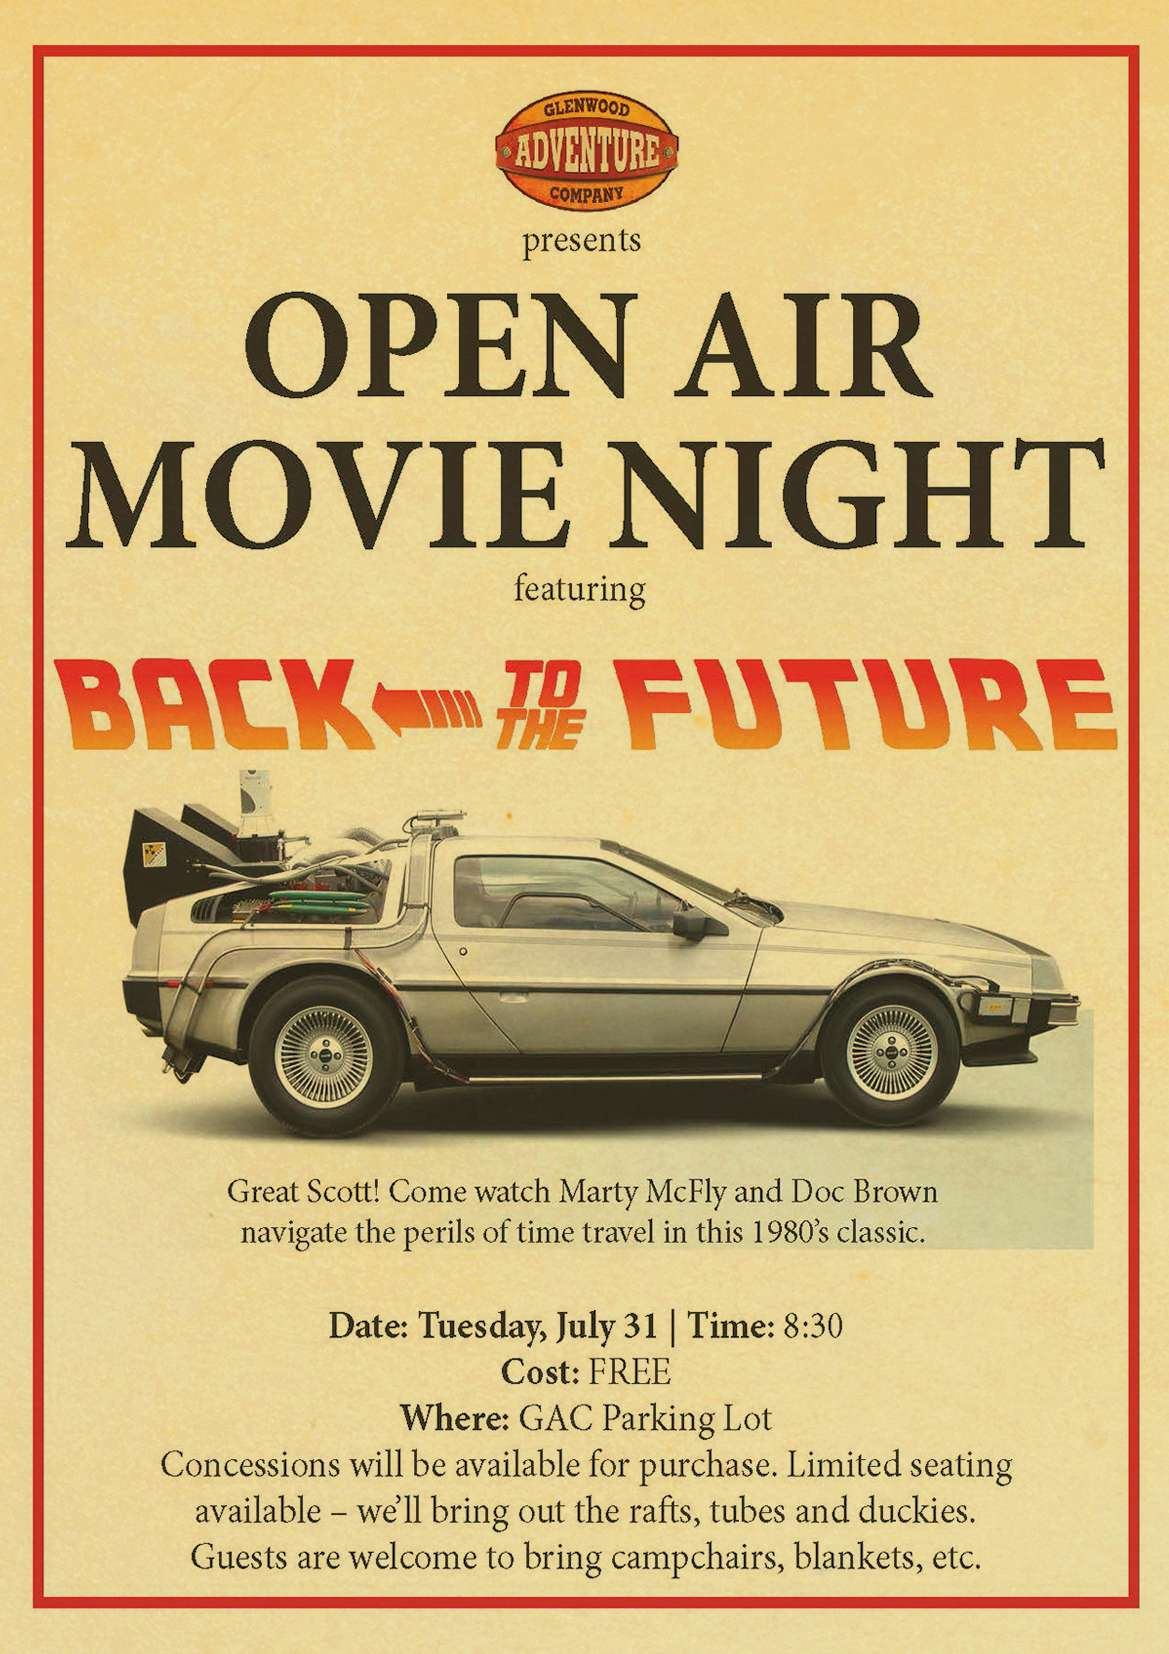 HTB1MESOc9MmBKNjSZTEq6ysKpXat Sci-fi Back to The Future Film Propaganda Retro Kraft Poster Decorative DIY Wall Canvas Sticker Home Bar Art Posters Decor